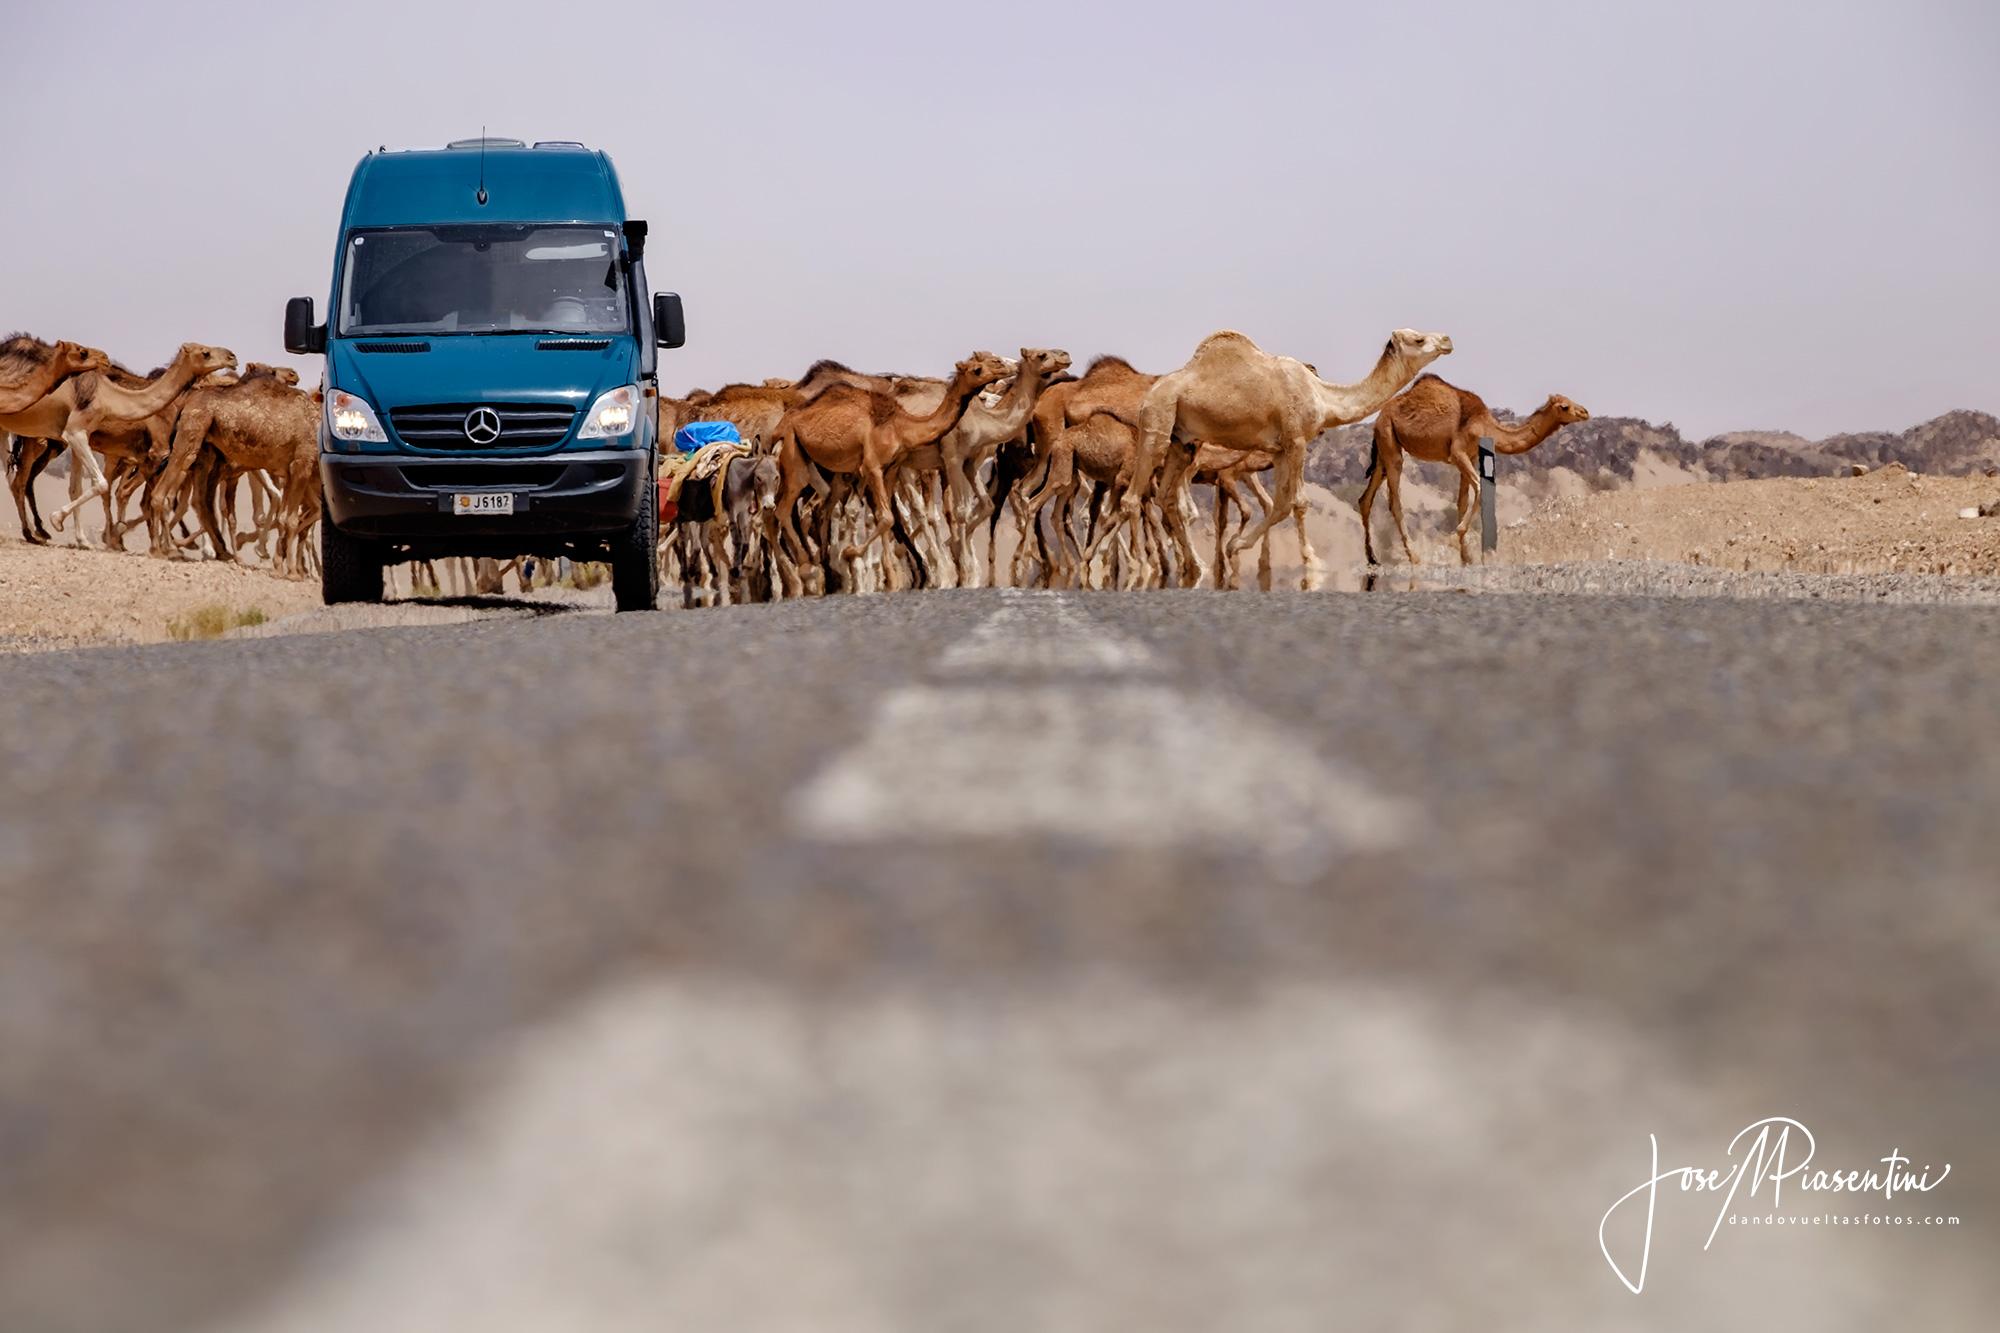 Camino-de-Tissint-a-Ksar-Talnidif-Marruecos